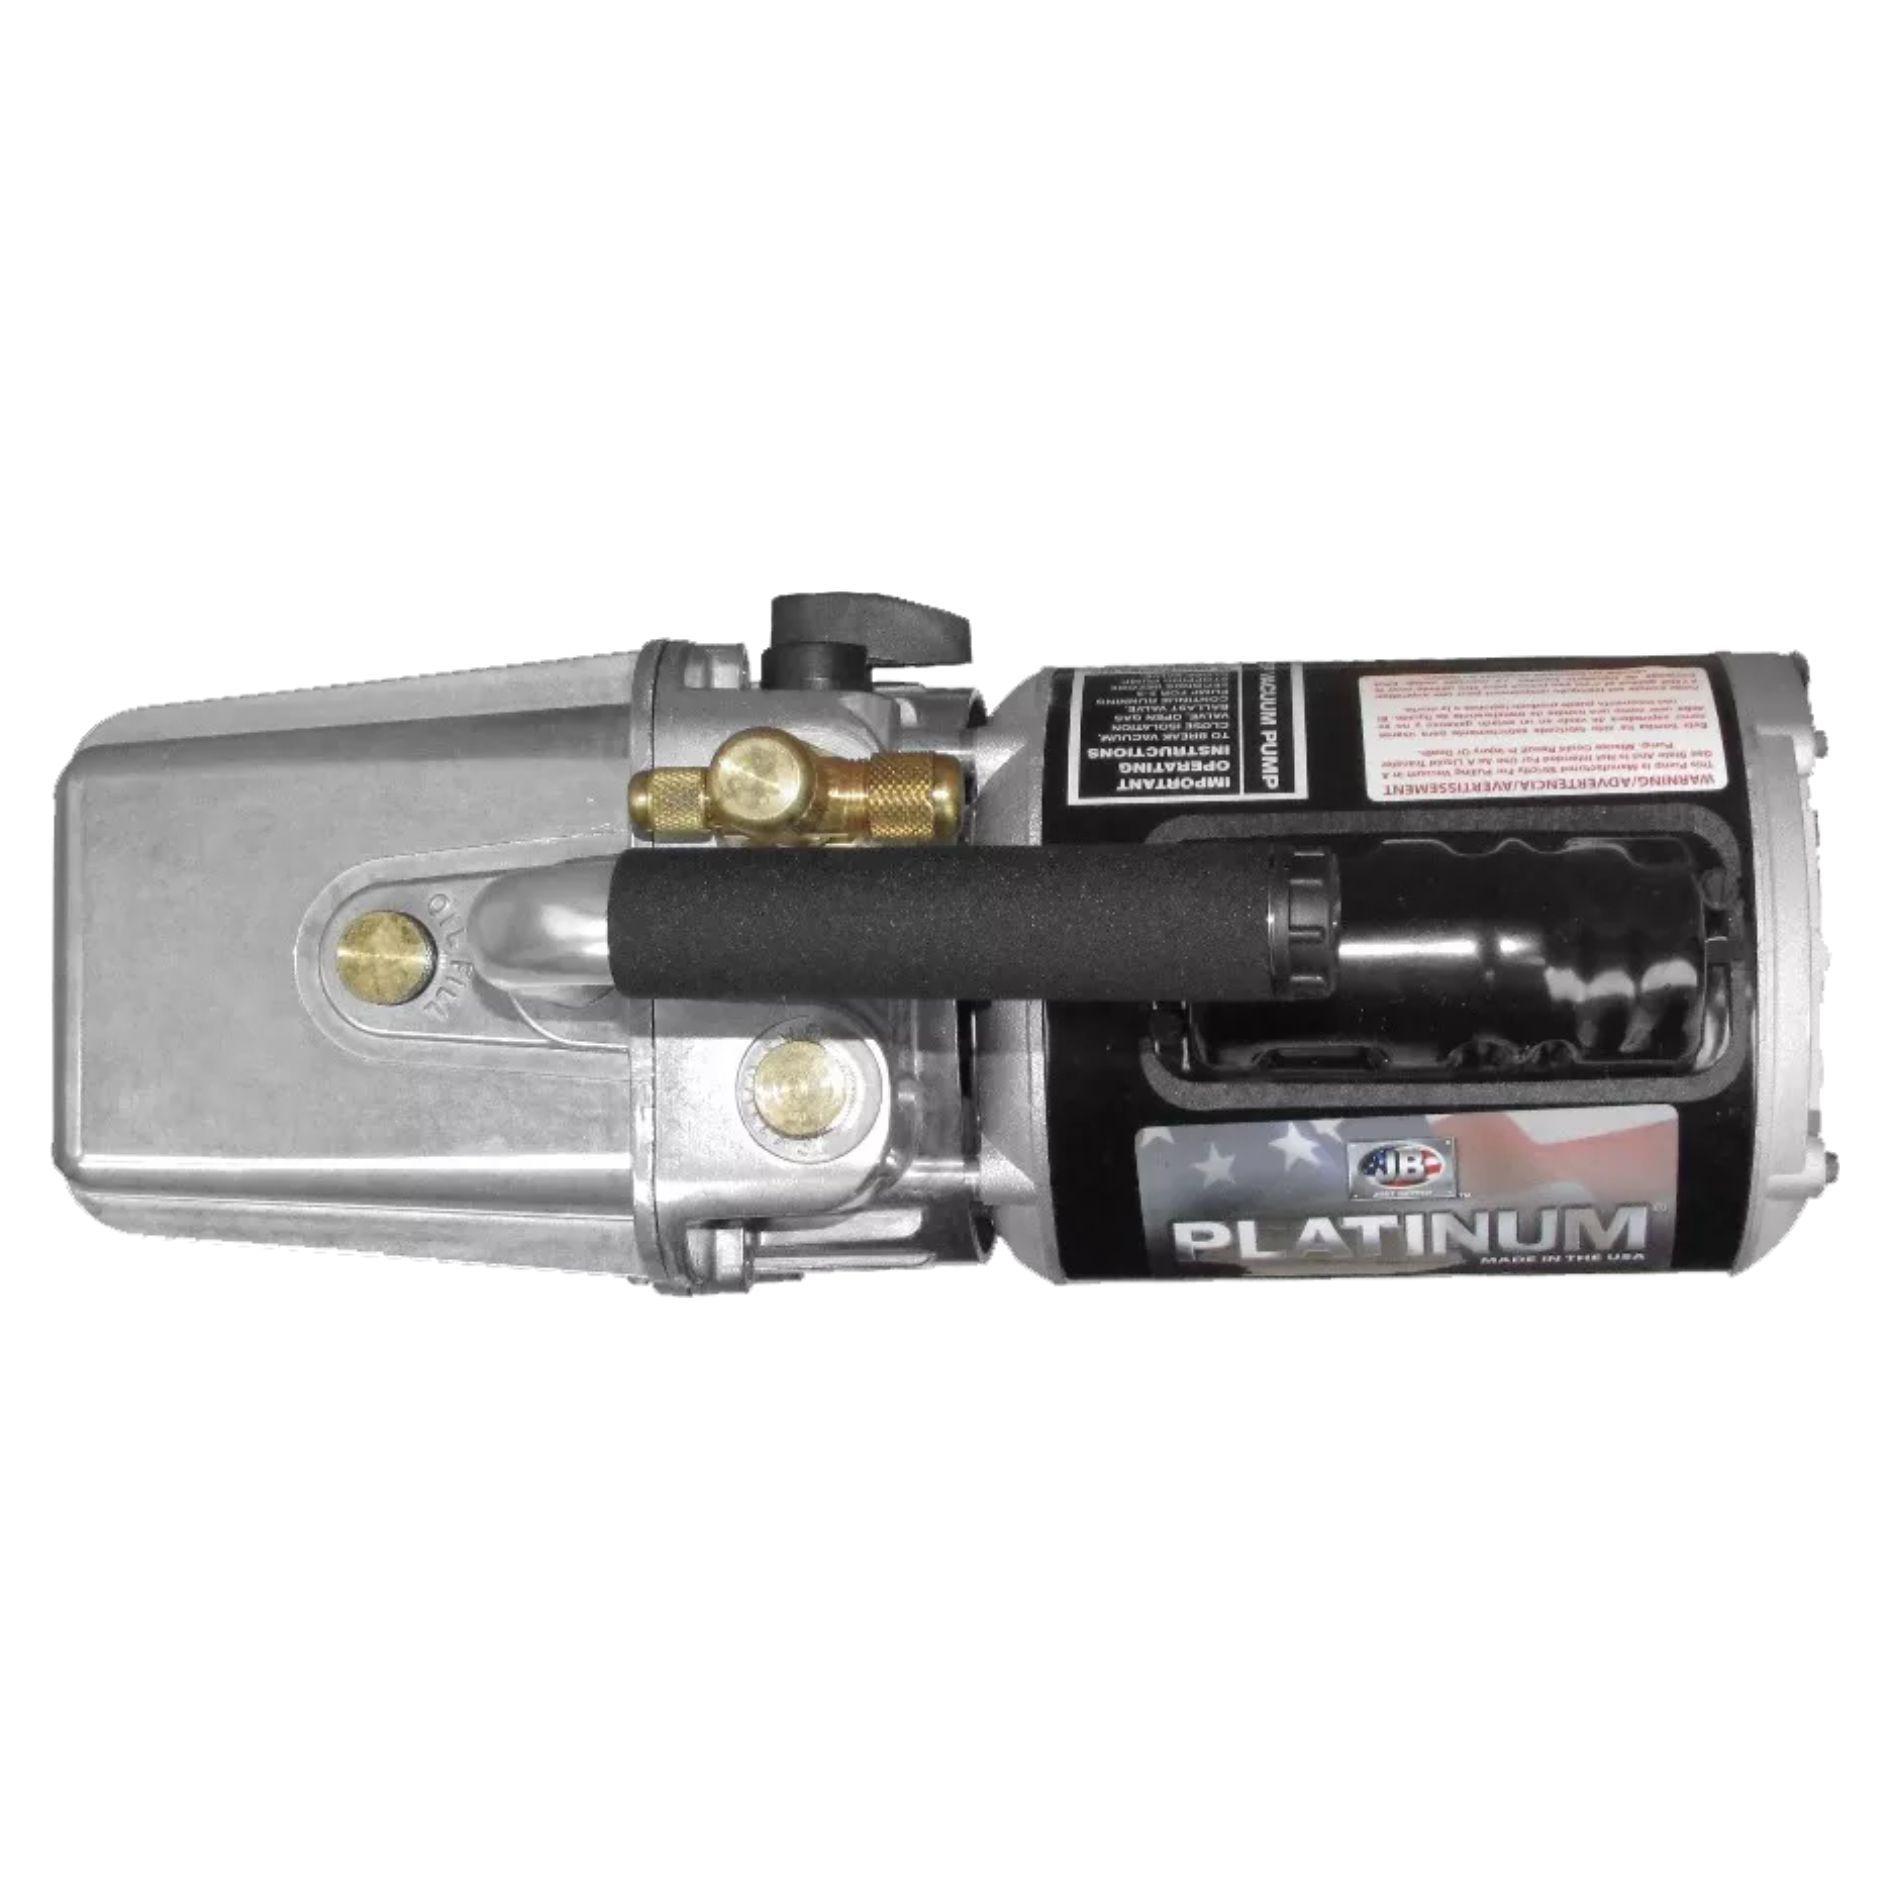 Bomba De Vácuo JB DV 285N-250 PLATINUM 10Cfm 2 Estágios Bivolt